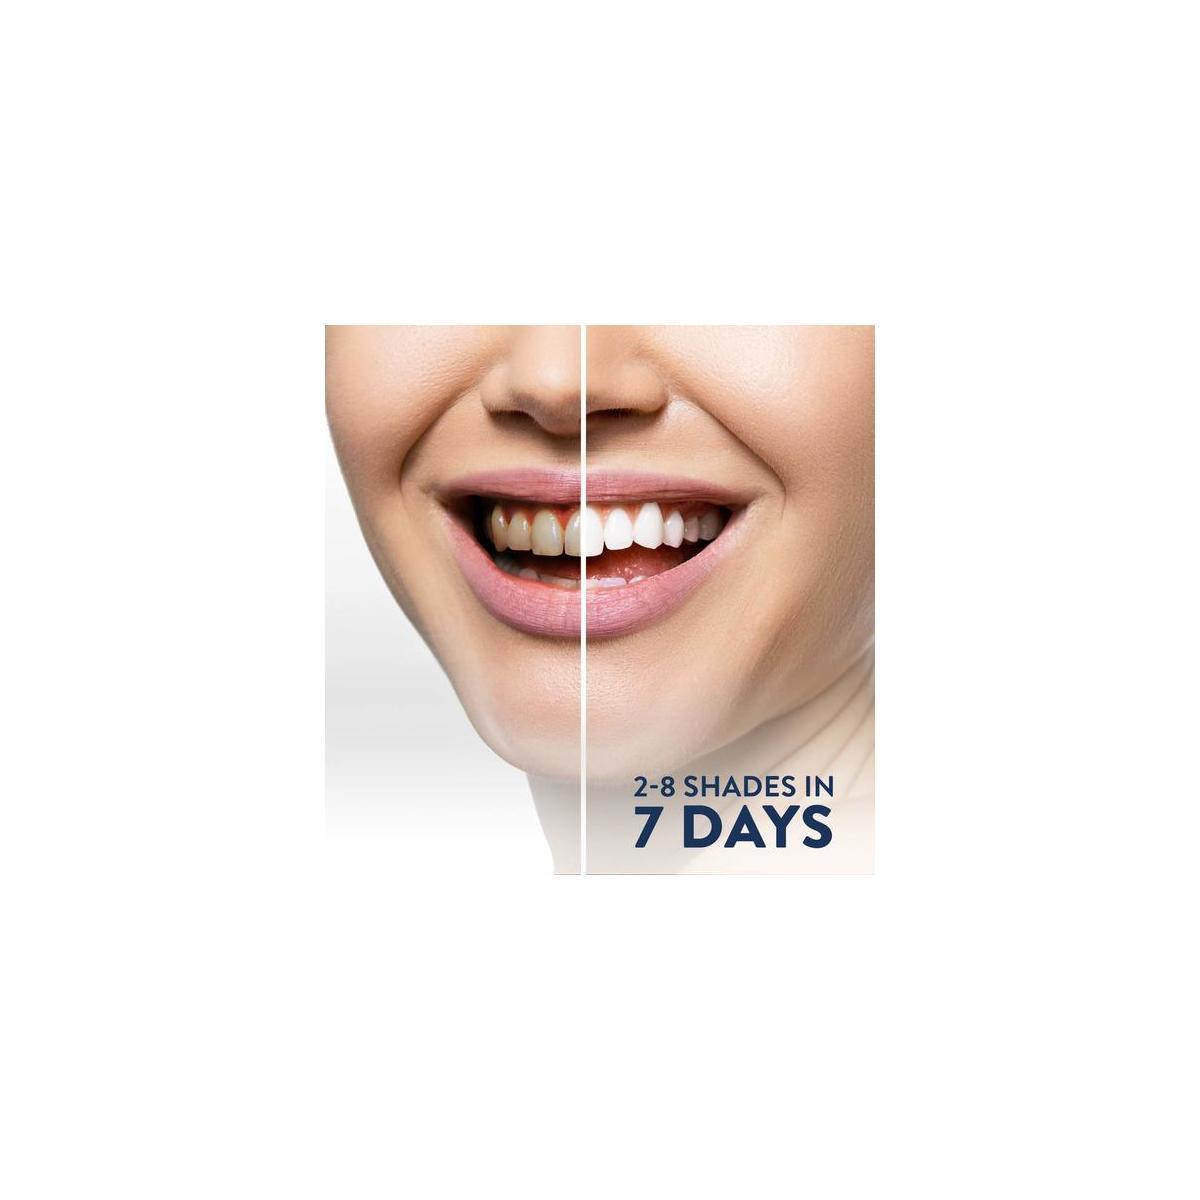 Teeth Whitening kit - Advanced 16X LED Teeth Whitening Light & Retainer Case